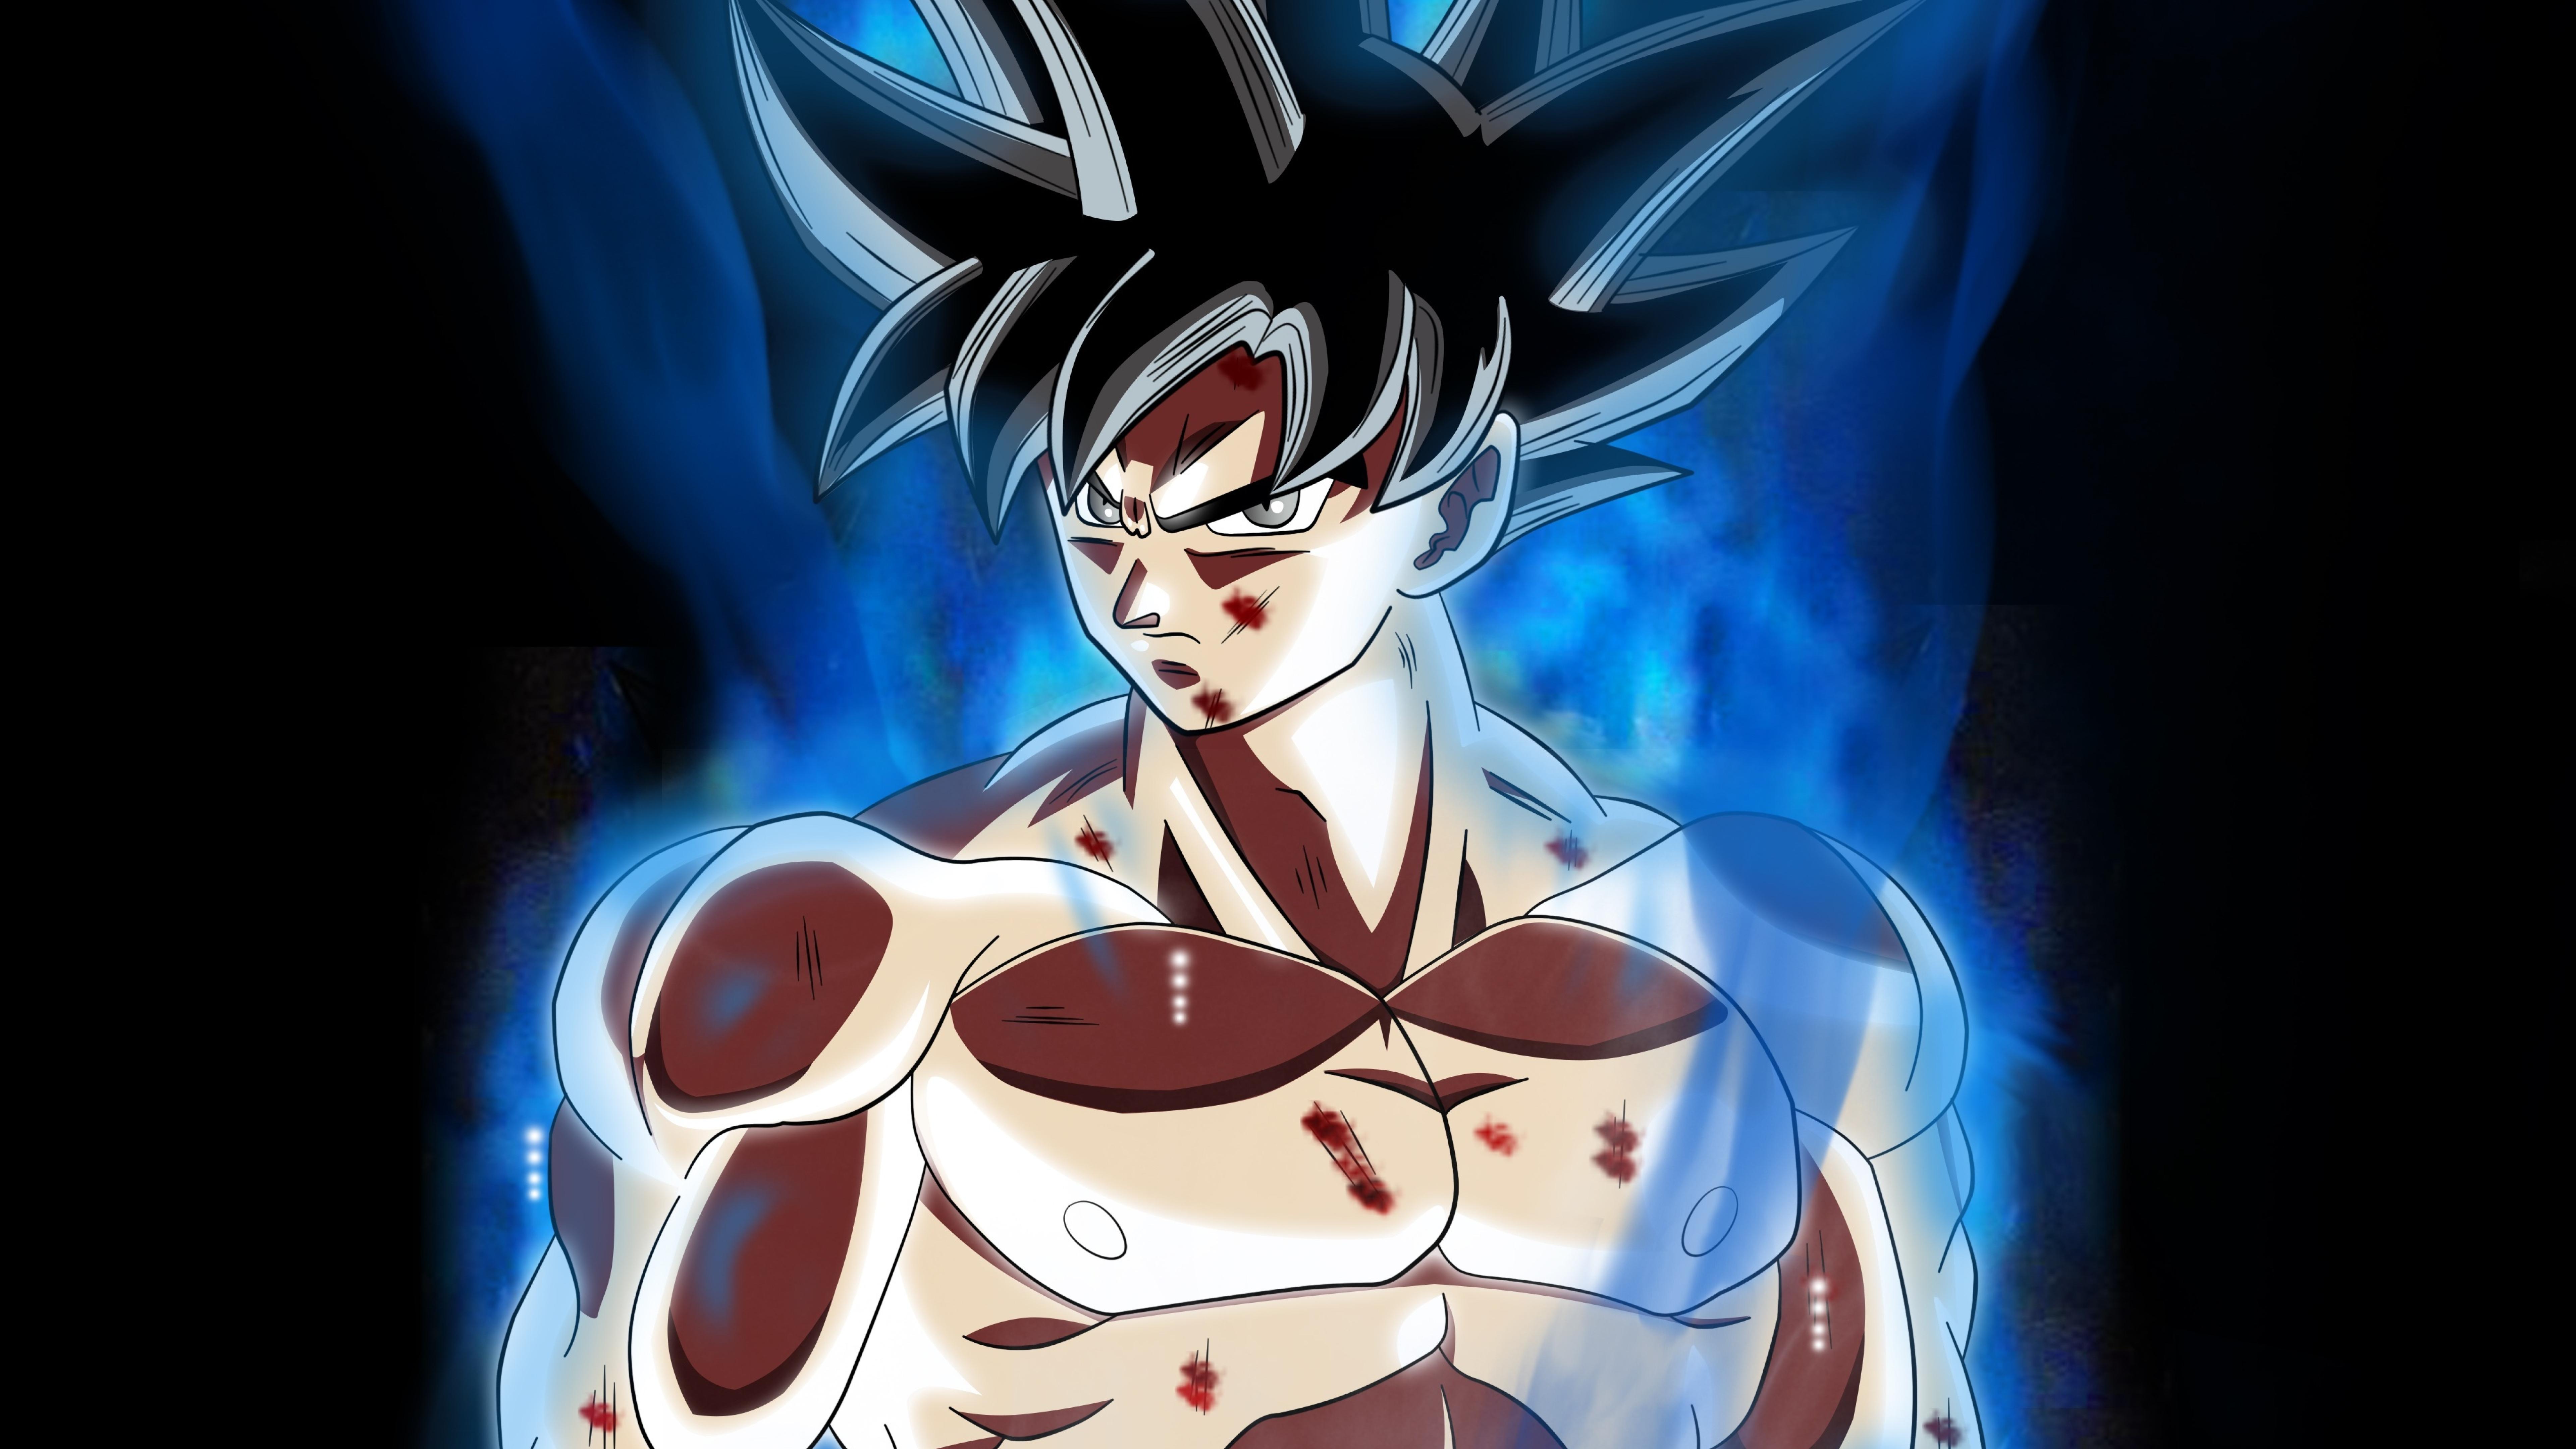 HD Exclusive Goku Ultra Instinct Wallpaper Hd 4k ...